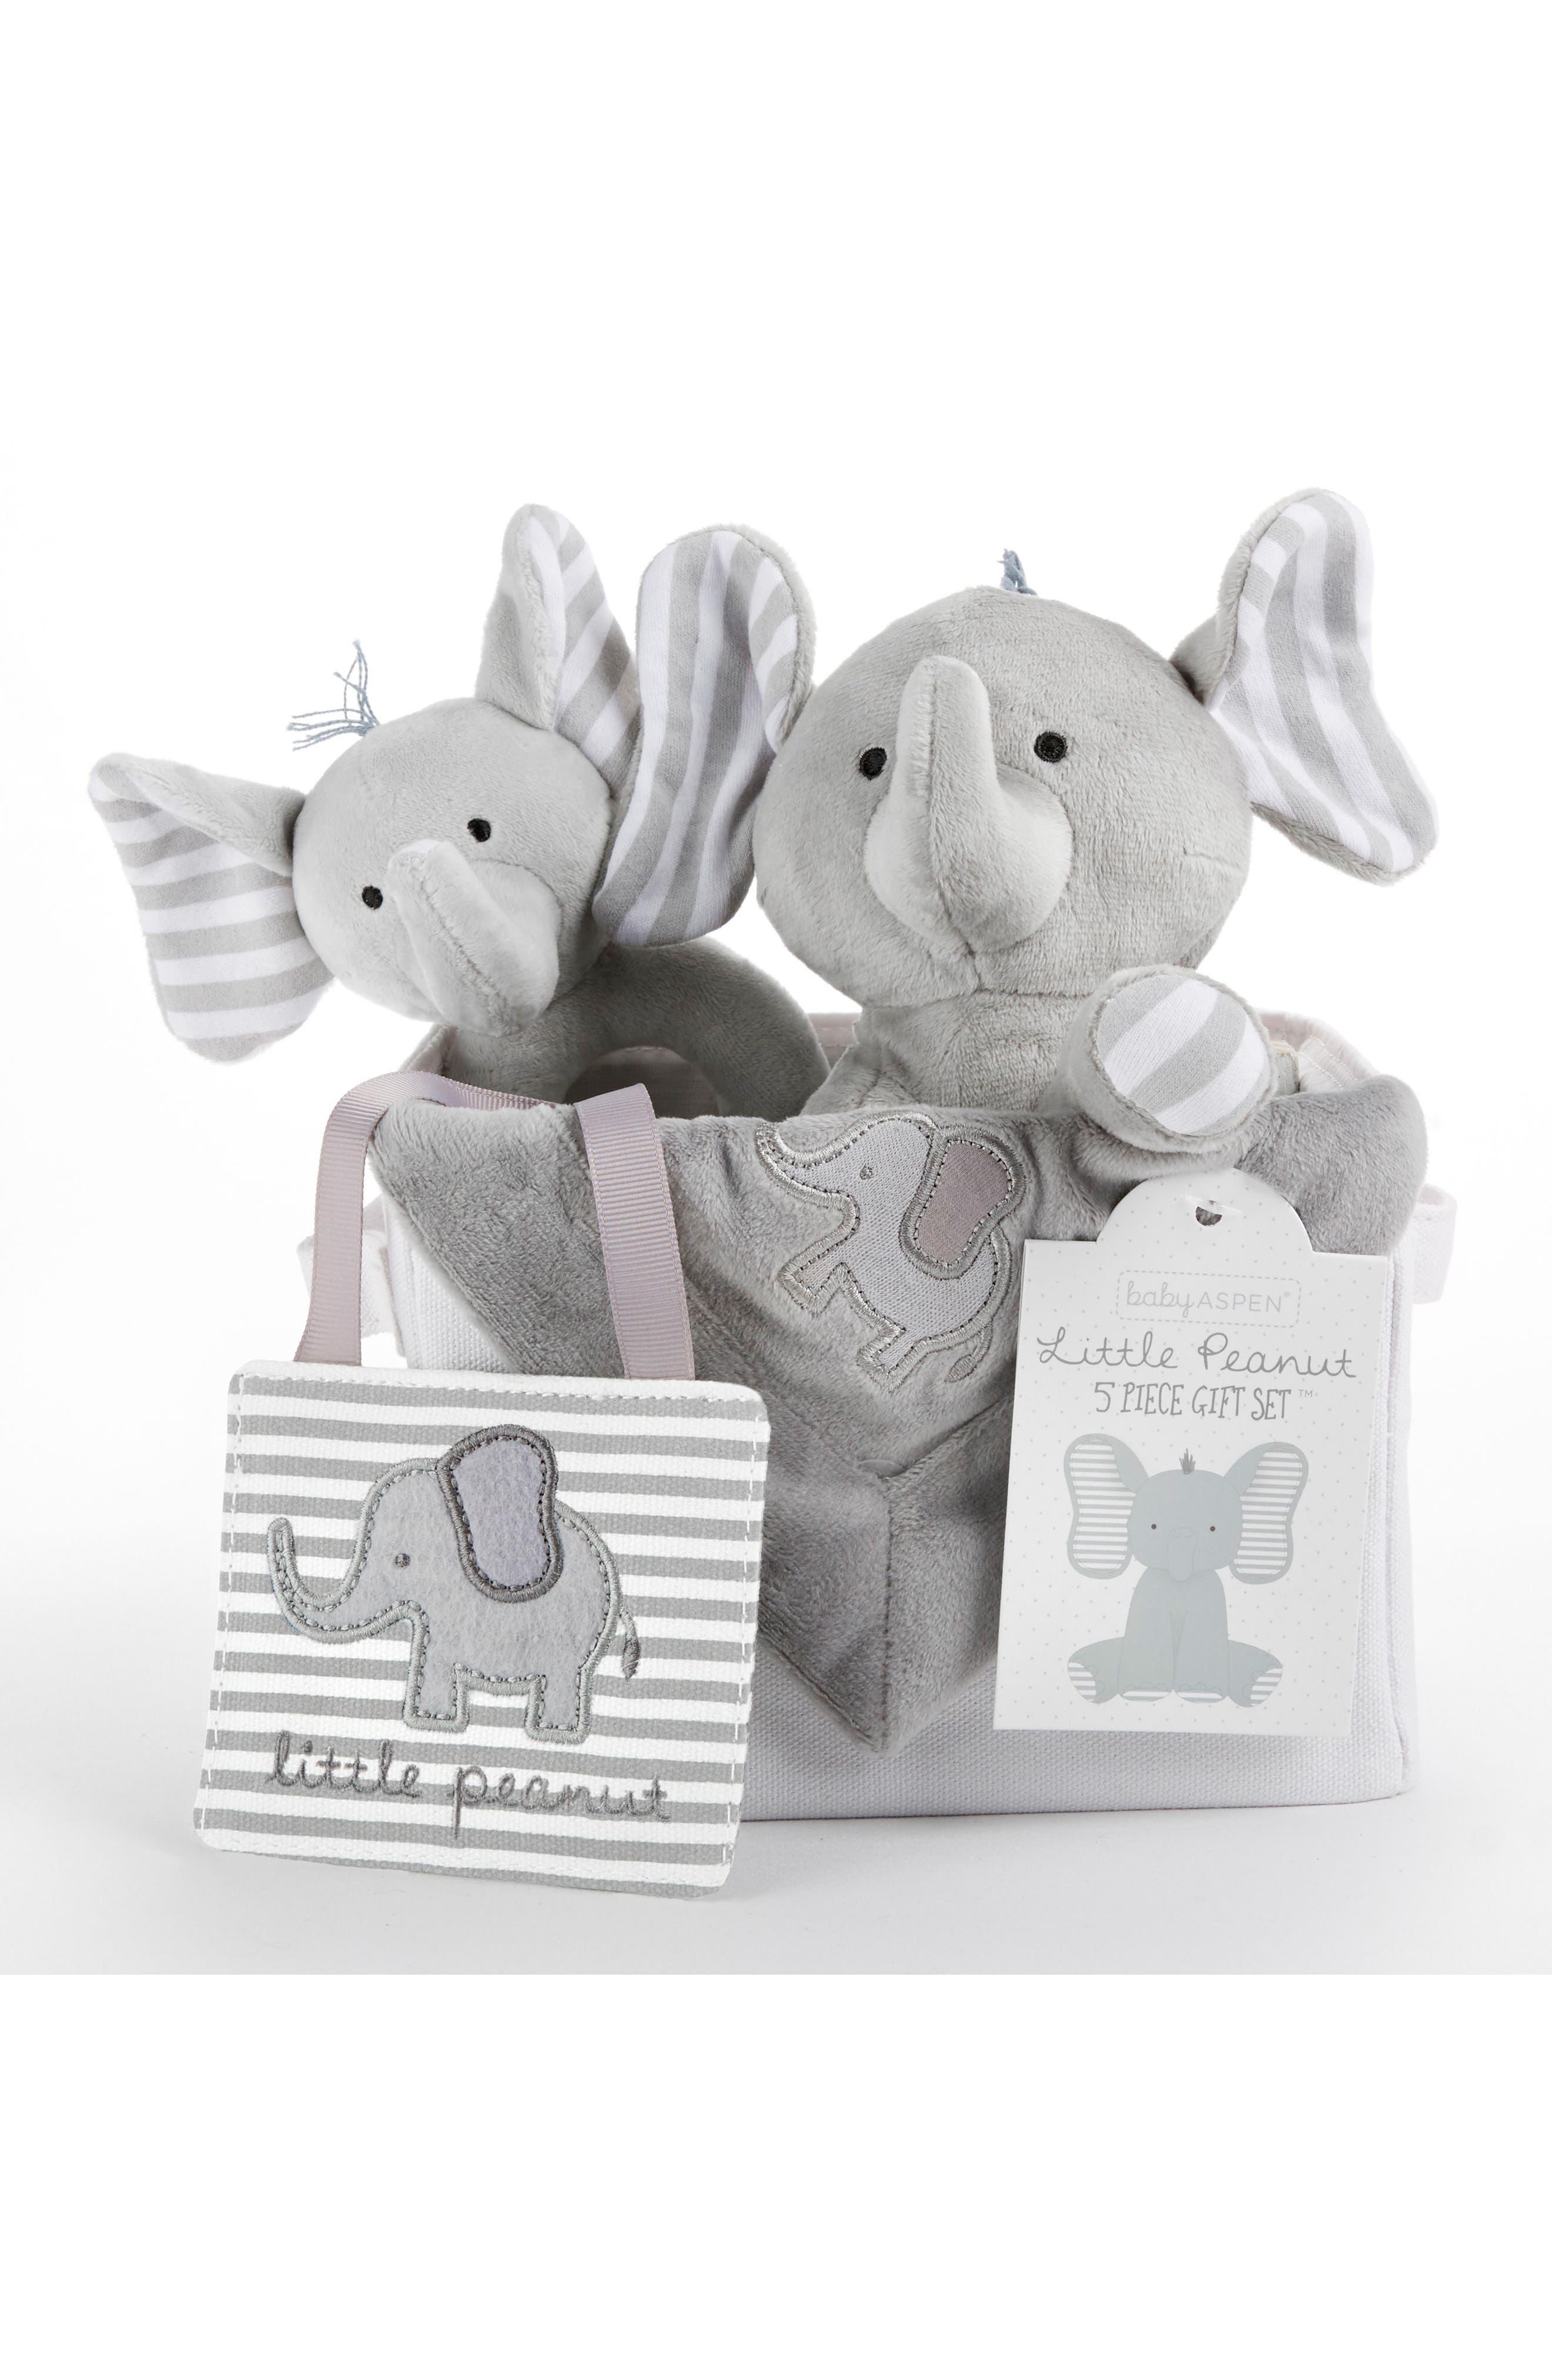 Main Image - Baby Aspen Little Peanut Elephant 5-Piece Gift Set